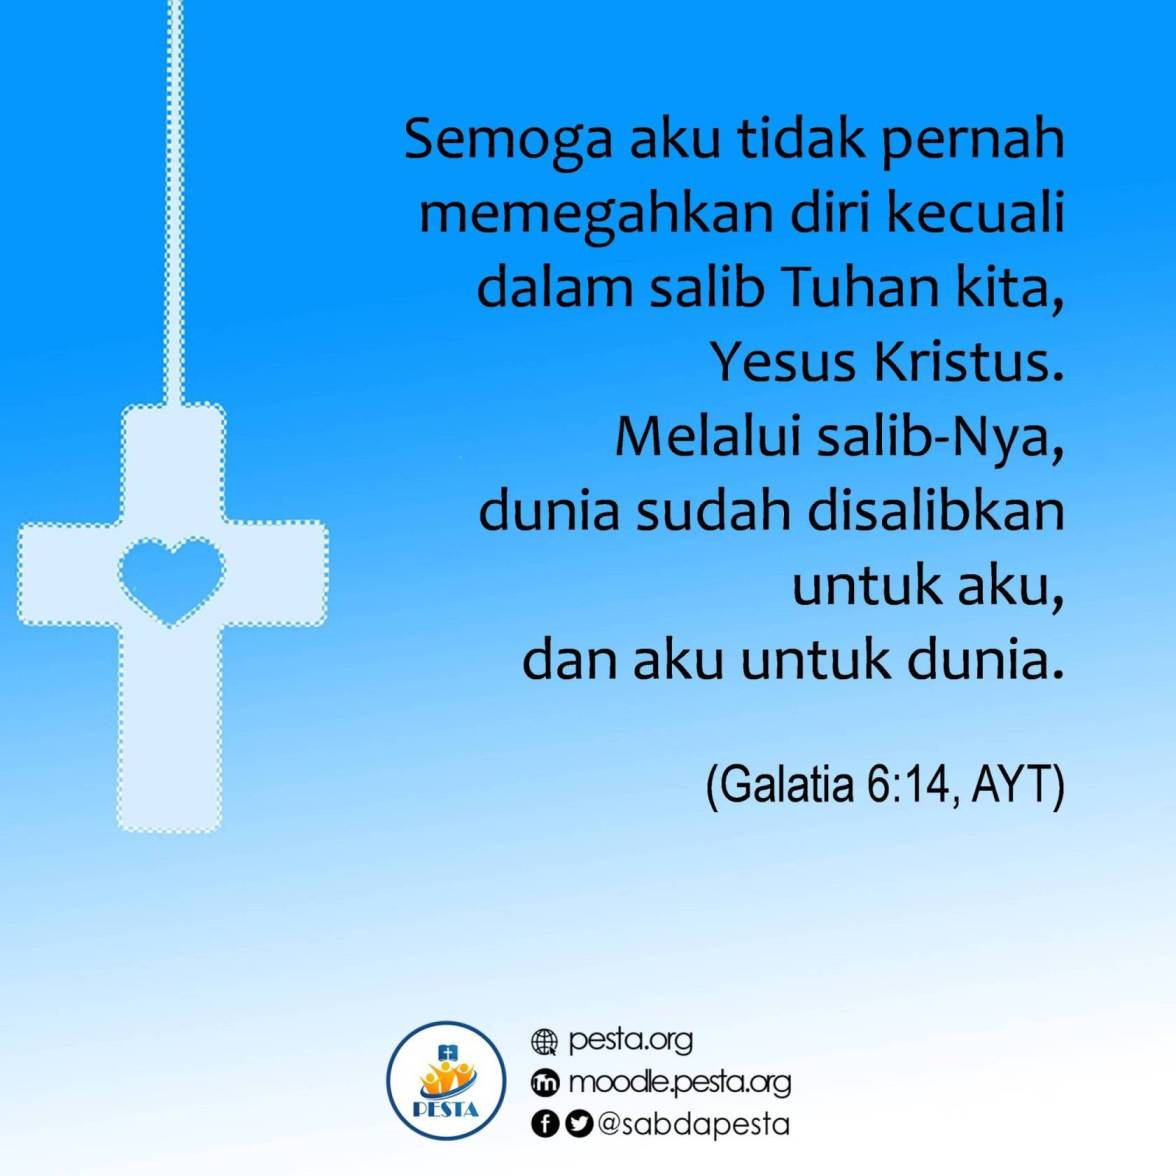 <a target='_blank' href='http://alkitab.mobi/?Galatia+6:14, '>Galatia 6:14</a>, AYT